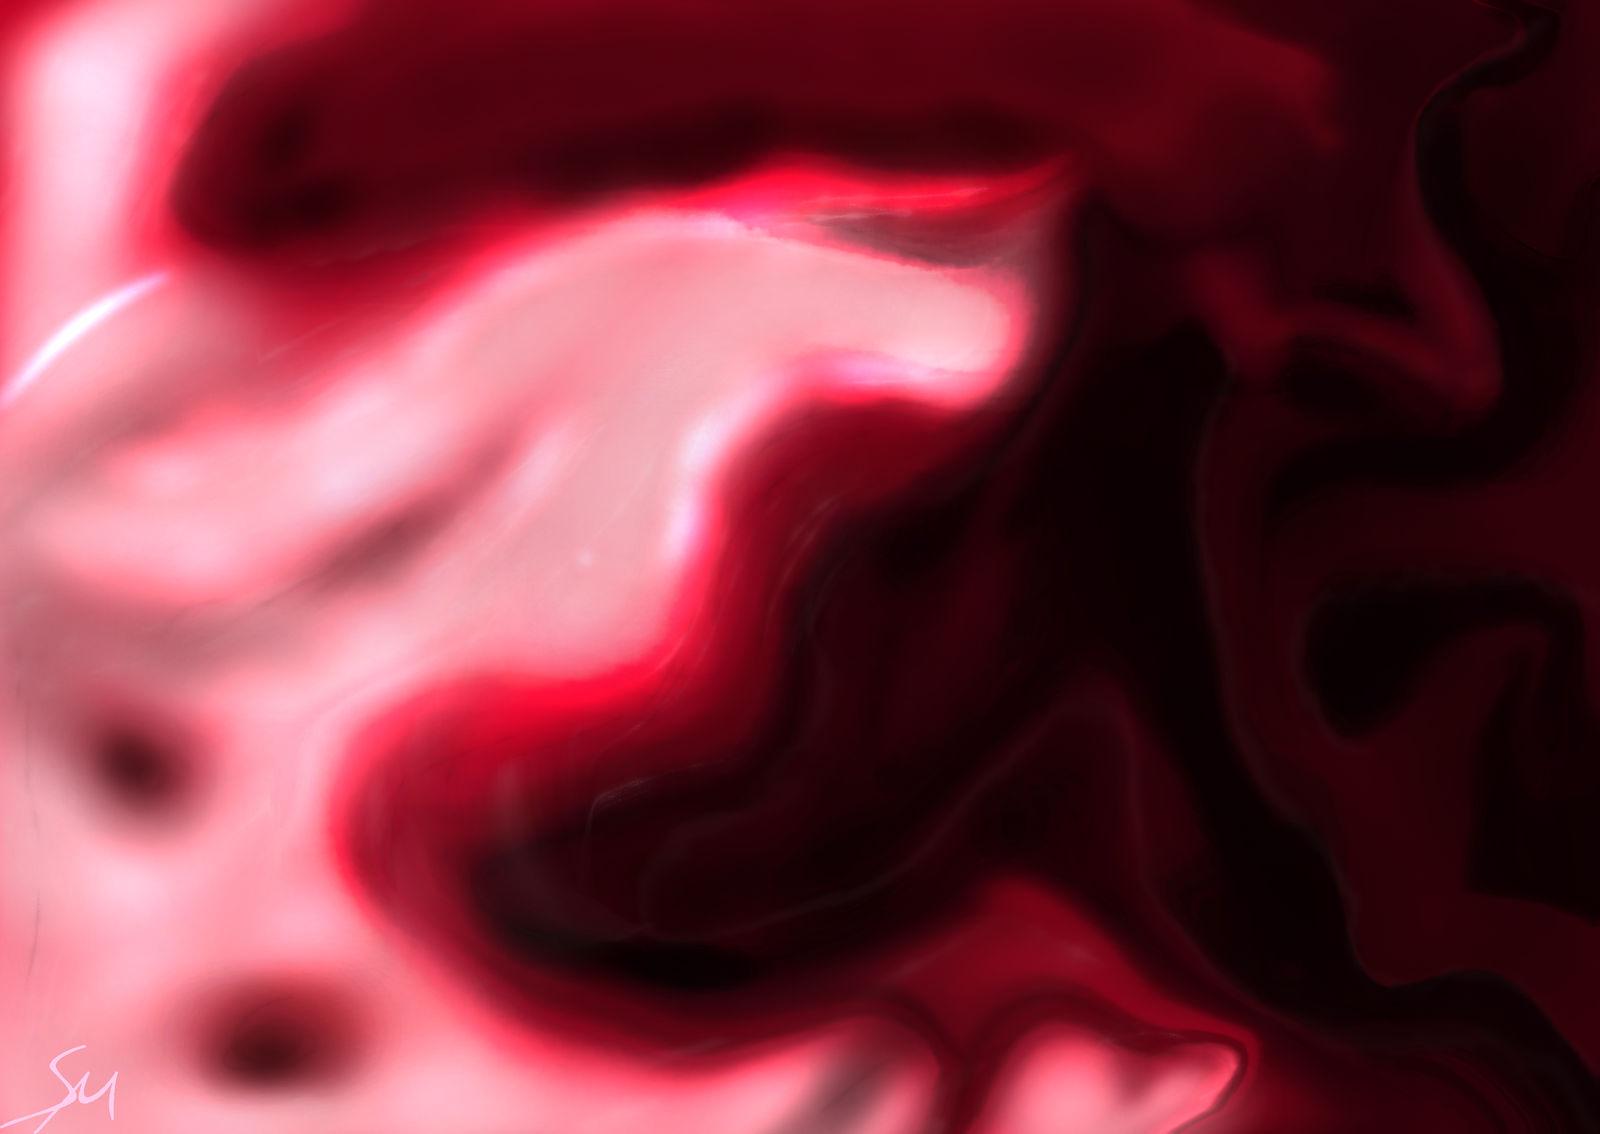 Dueling Crimson